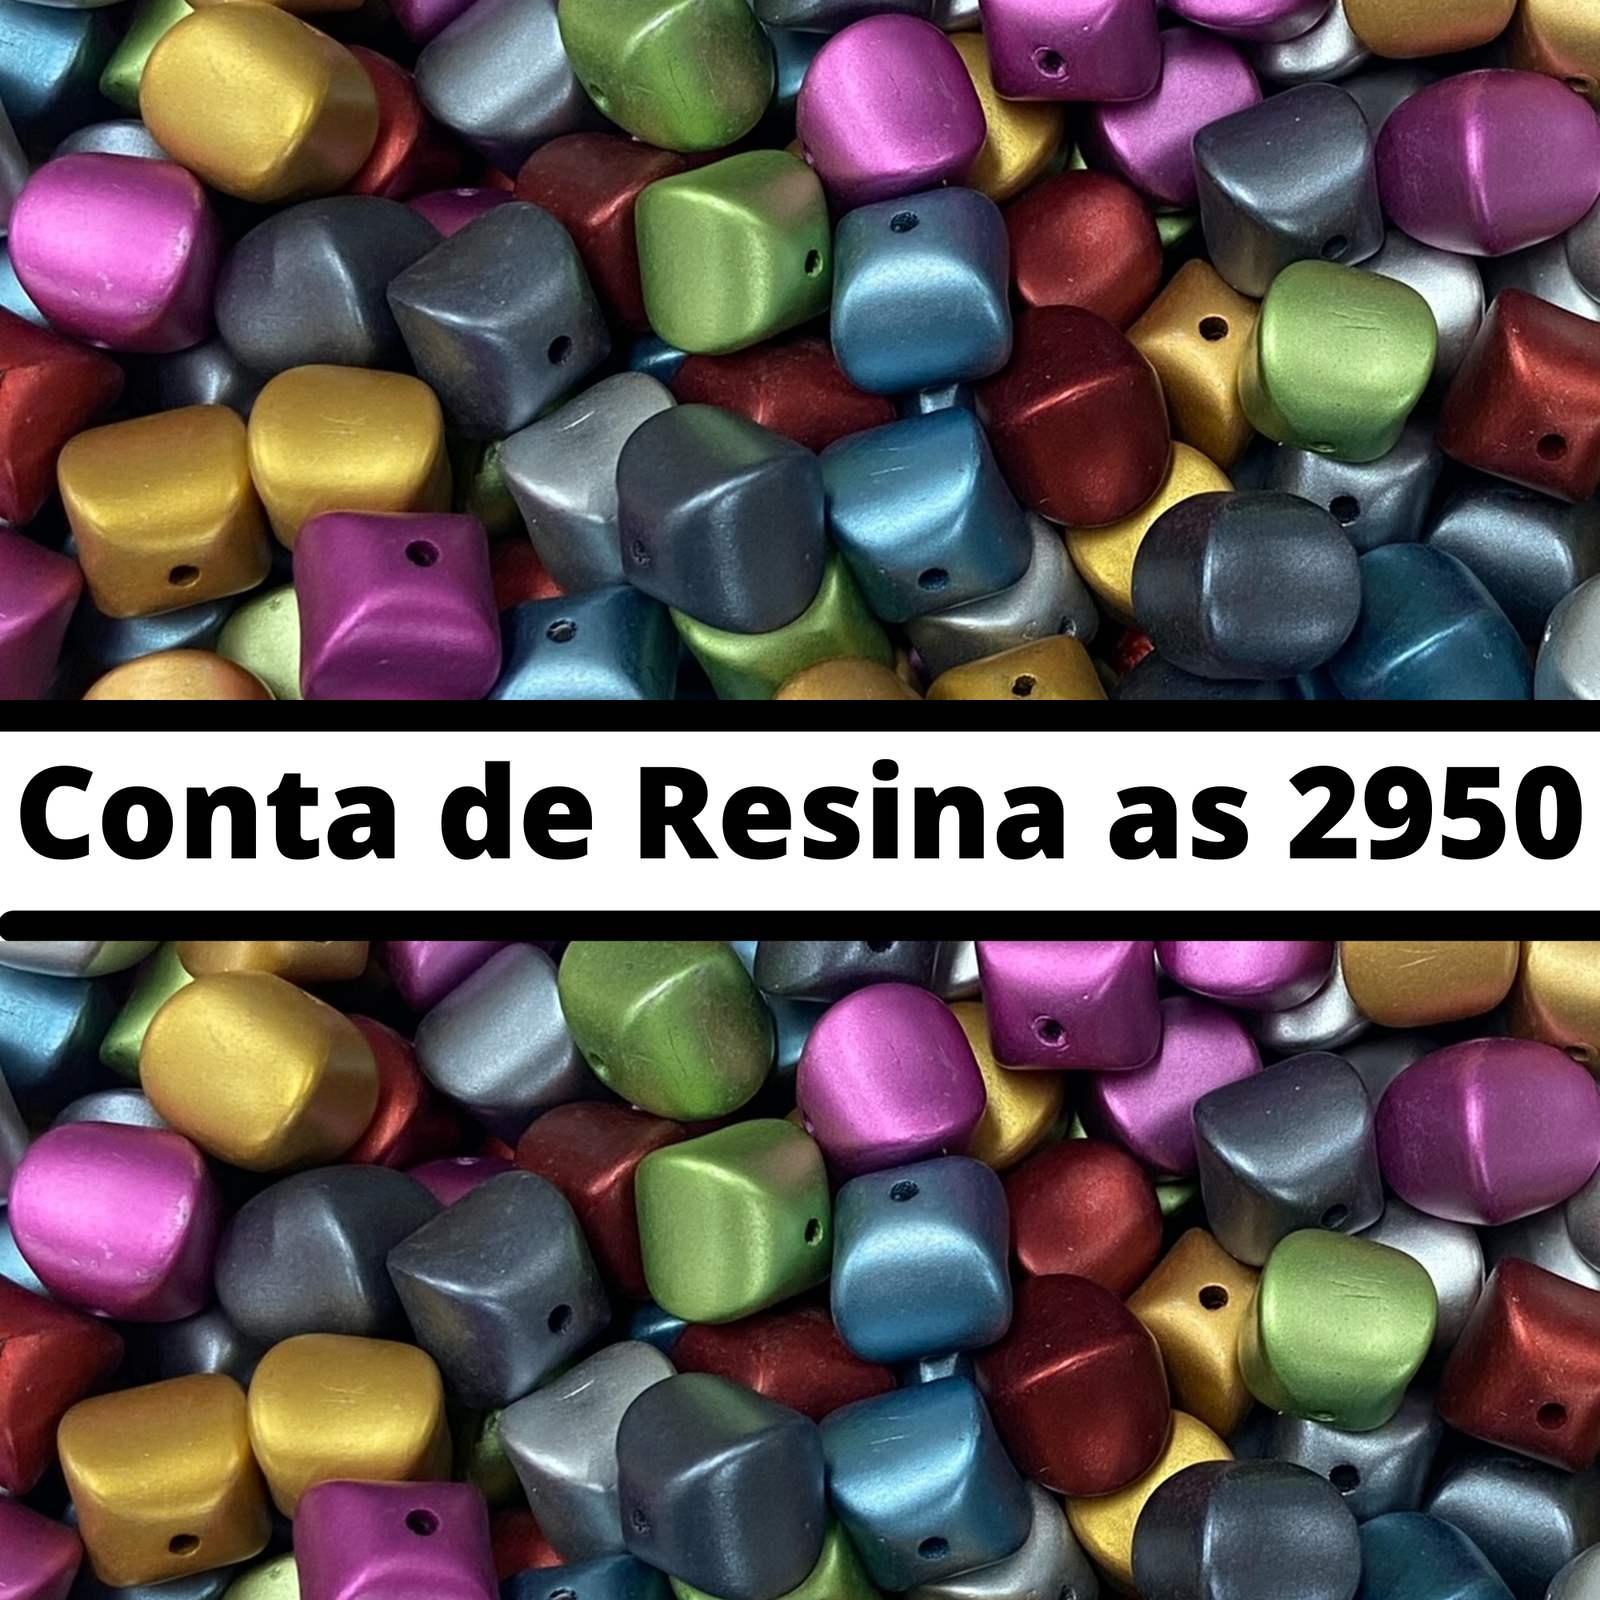 Conta de Resina Metalizada 11mm as2950 - 500g